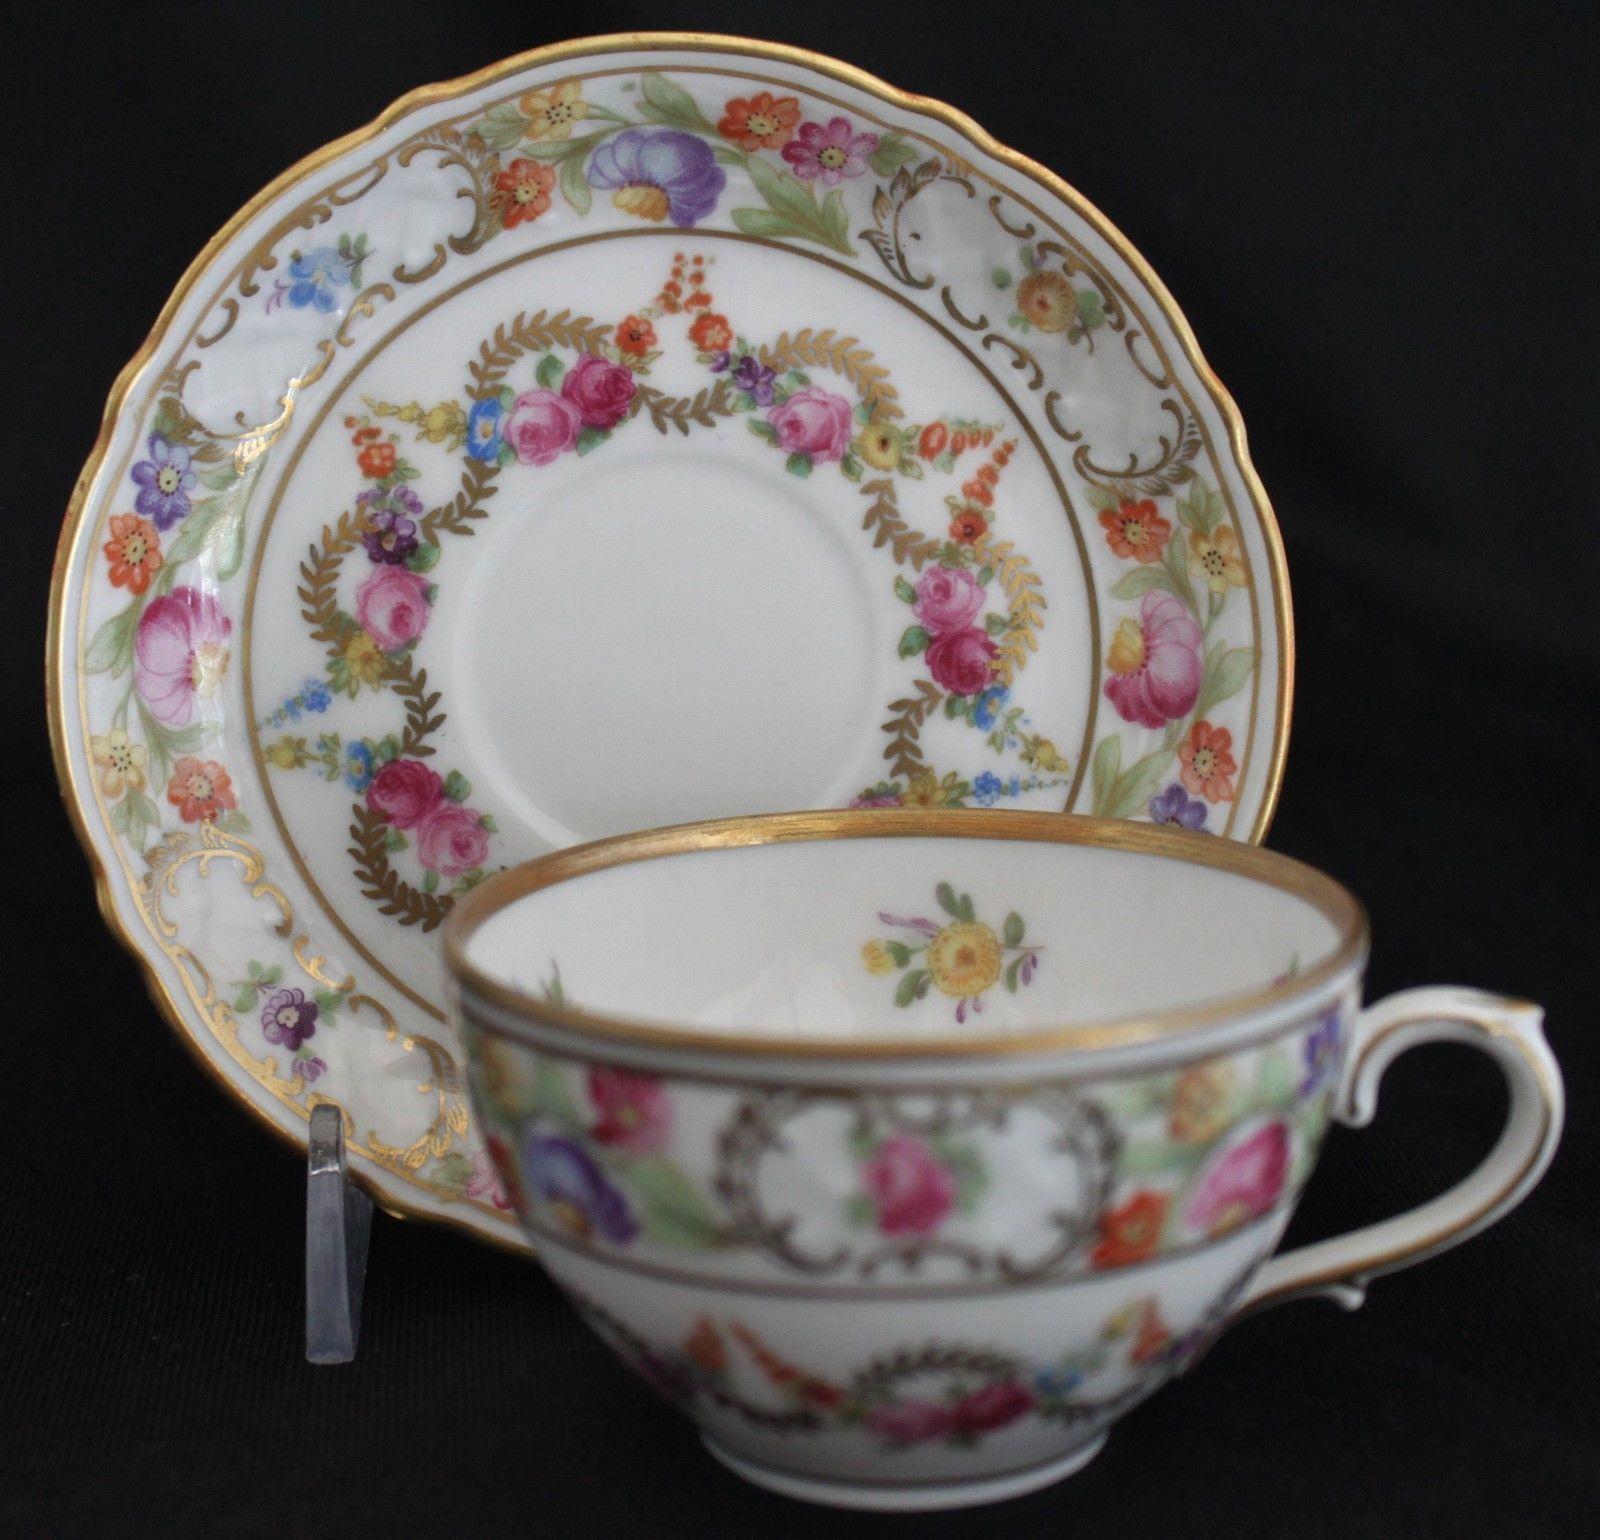 Royal albert bone china tea cup amp saucer winsome pattern ebay - Empress Dresden Flowers Variation Aka Sch2 By Schumann Germany Demi Cup Saucer